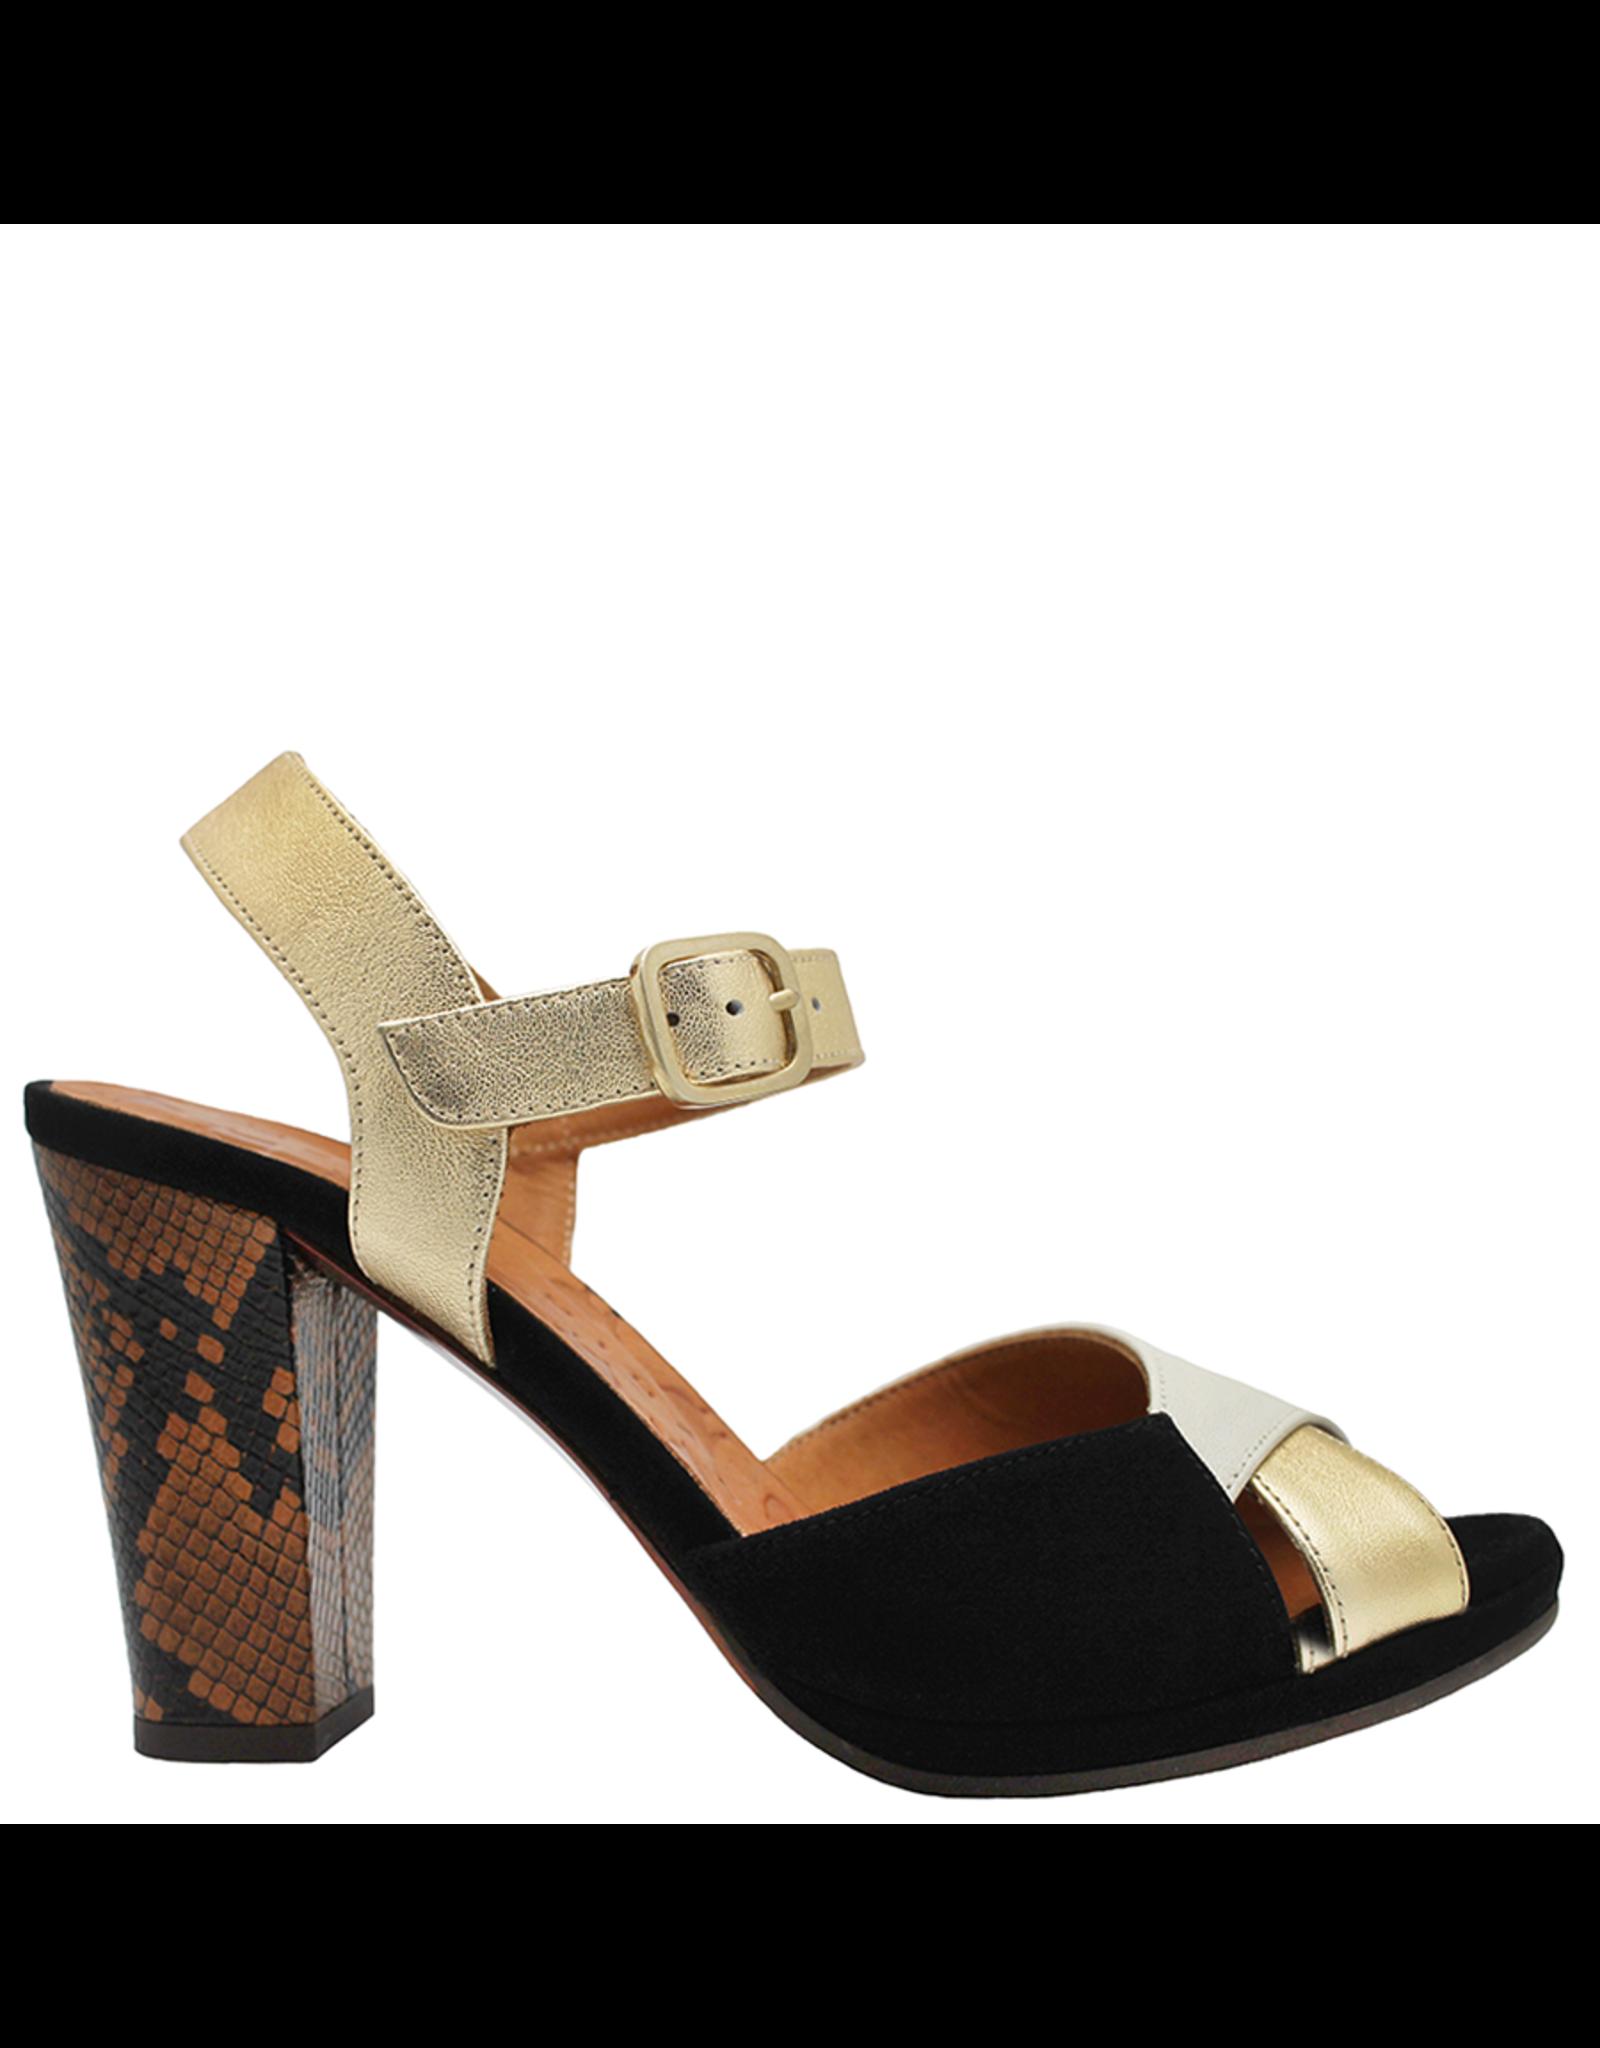 ChieMihara ChieMihara Black Suede Leche And Platinum Buckled Sandal Abra